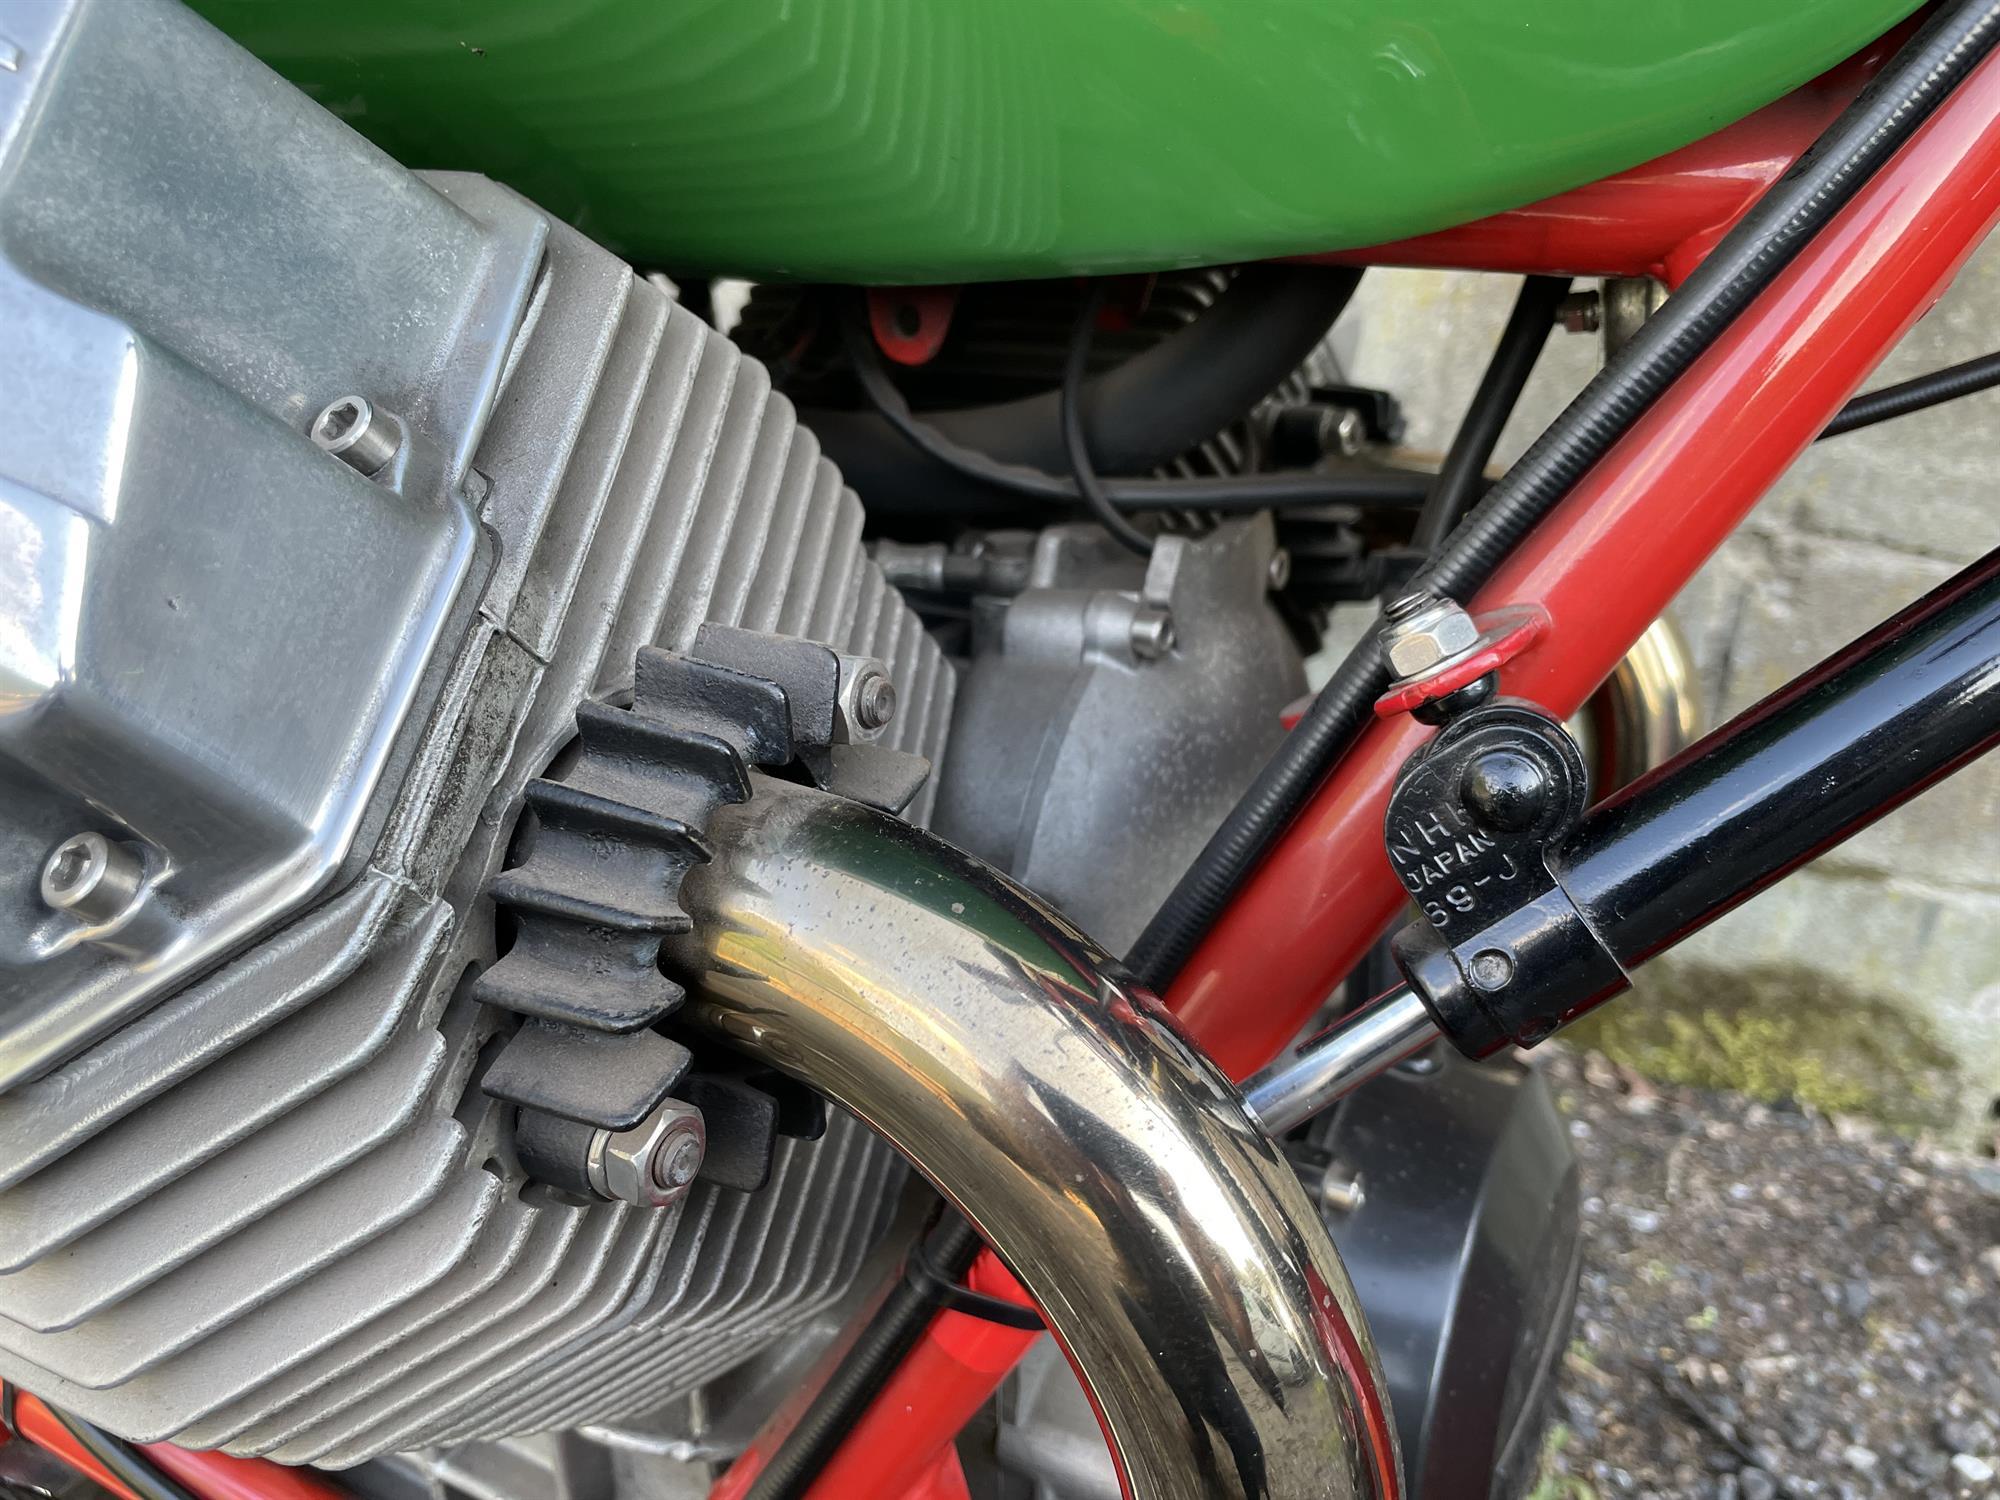 1983 Moto Guzzi 850 Le Mans III - Image 10 of 10